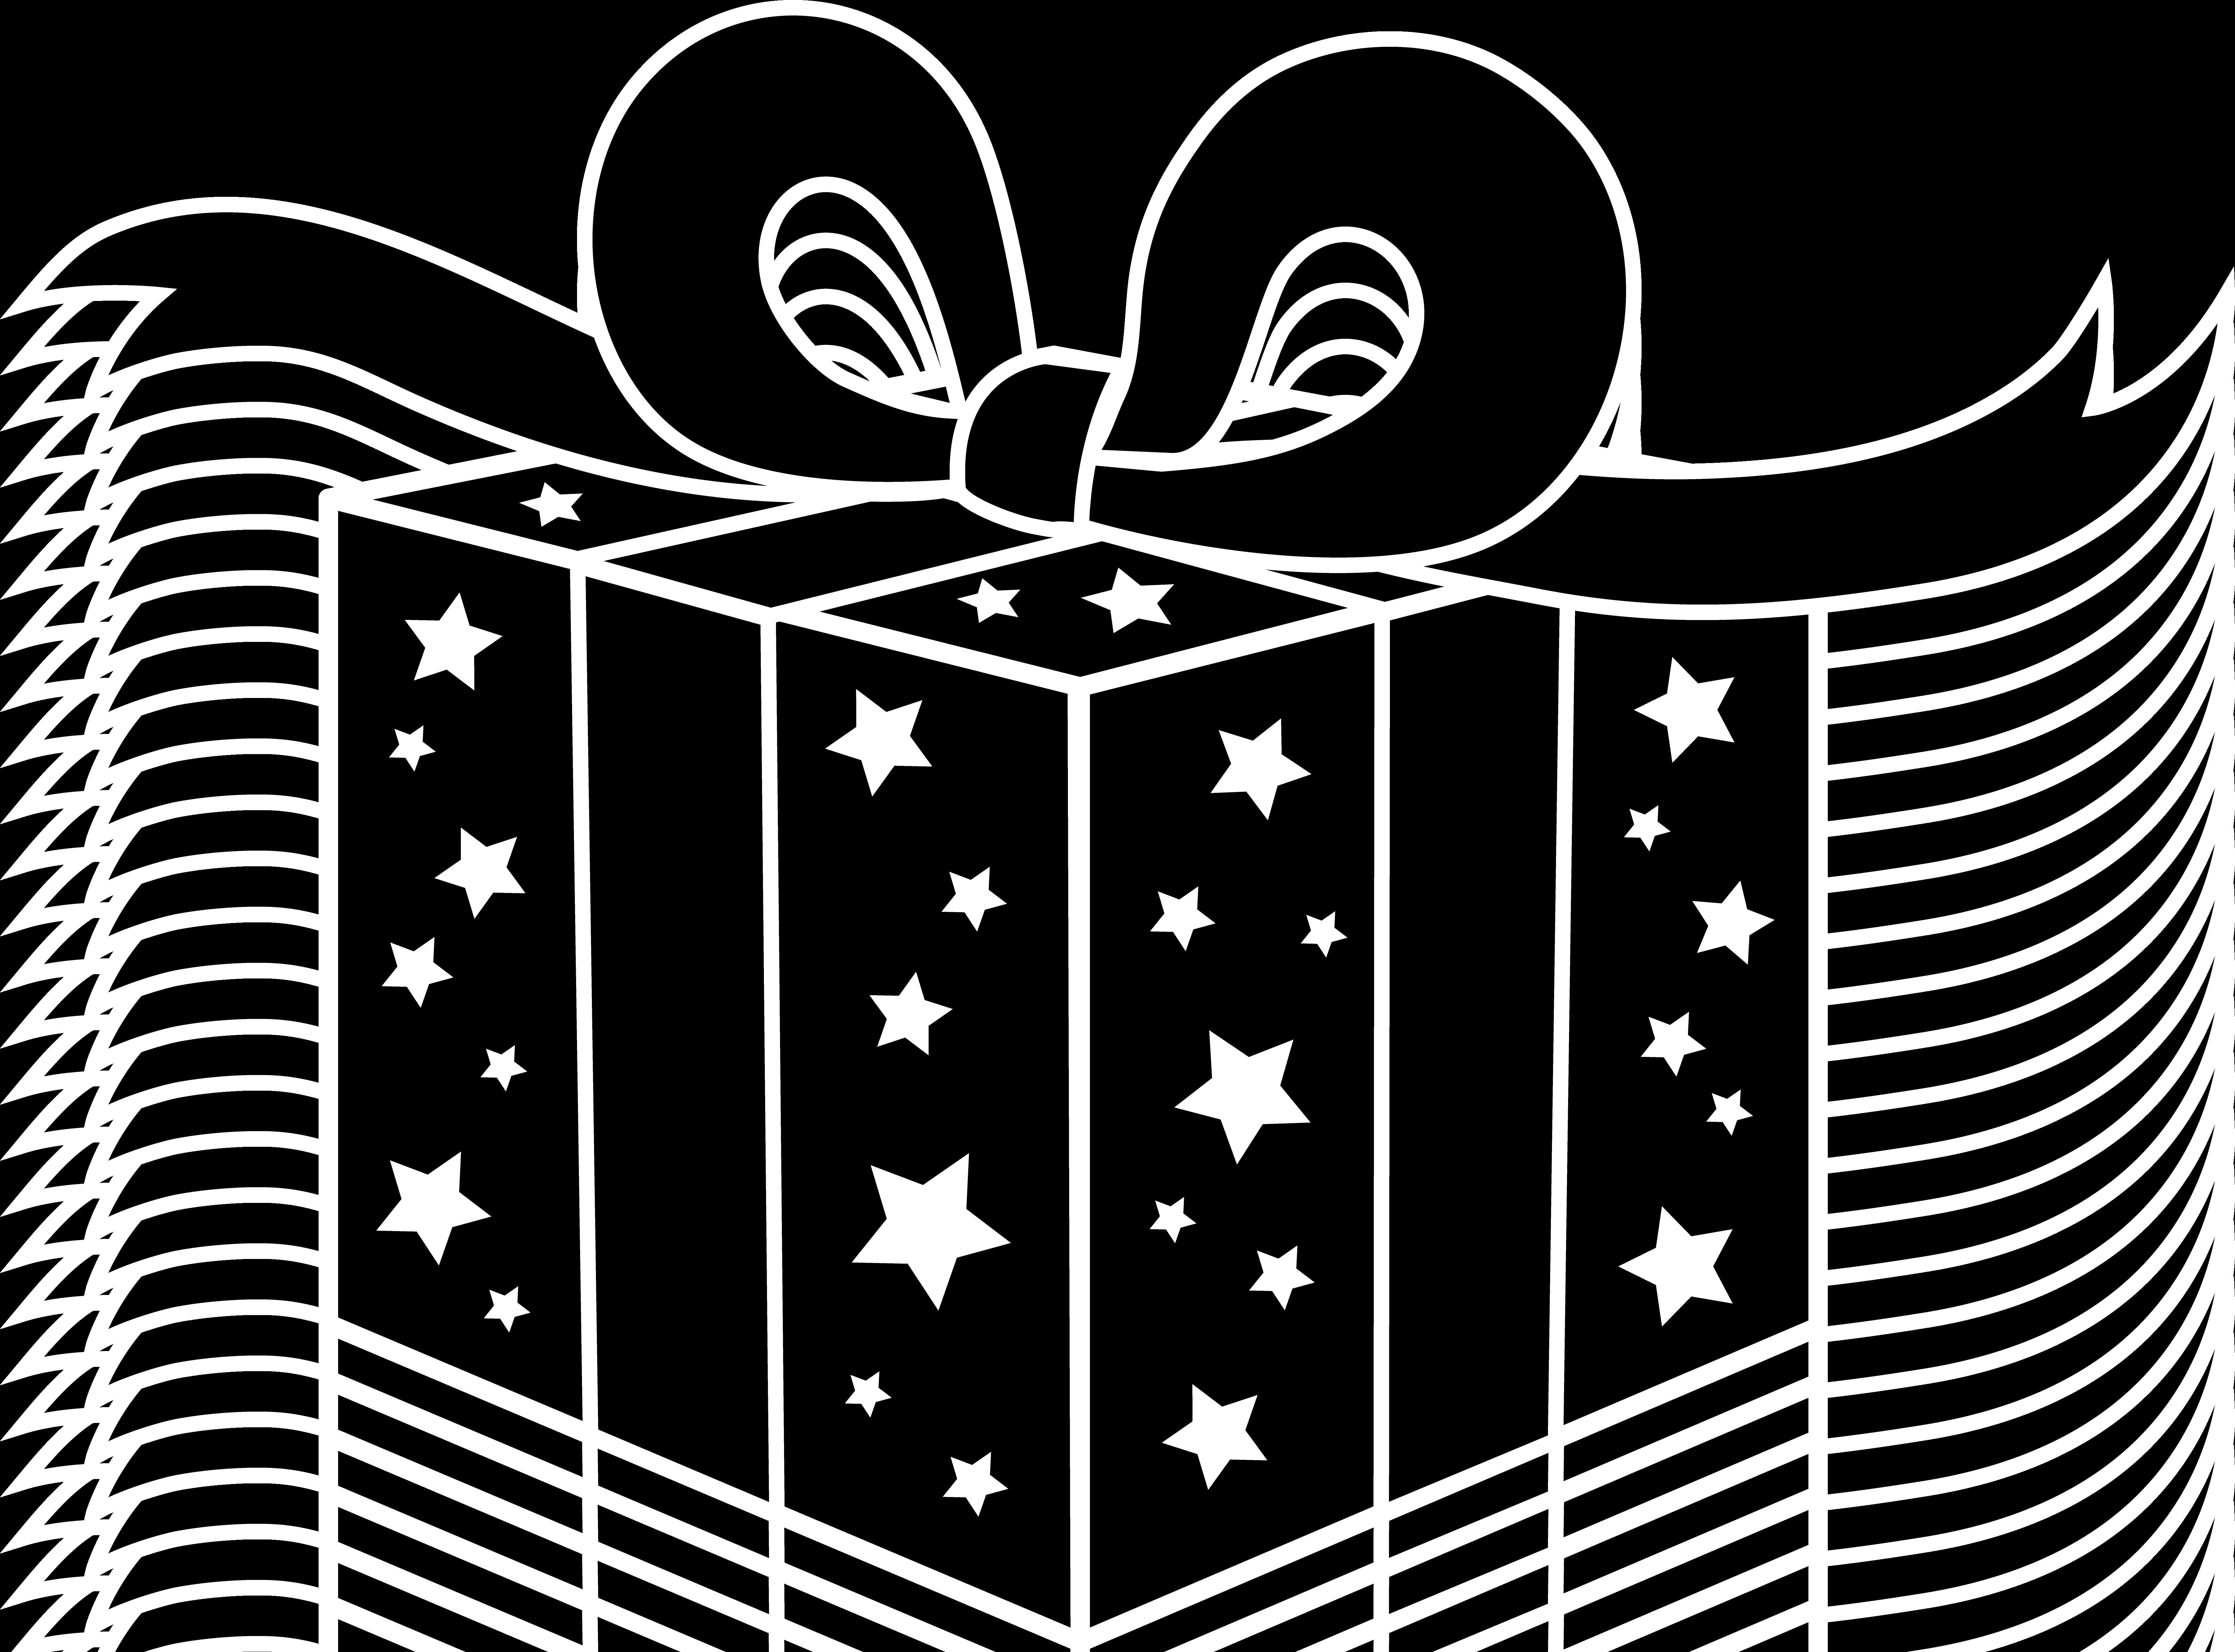 Free Birthday Cliparts Black, Download Free Clip Art, Free ...